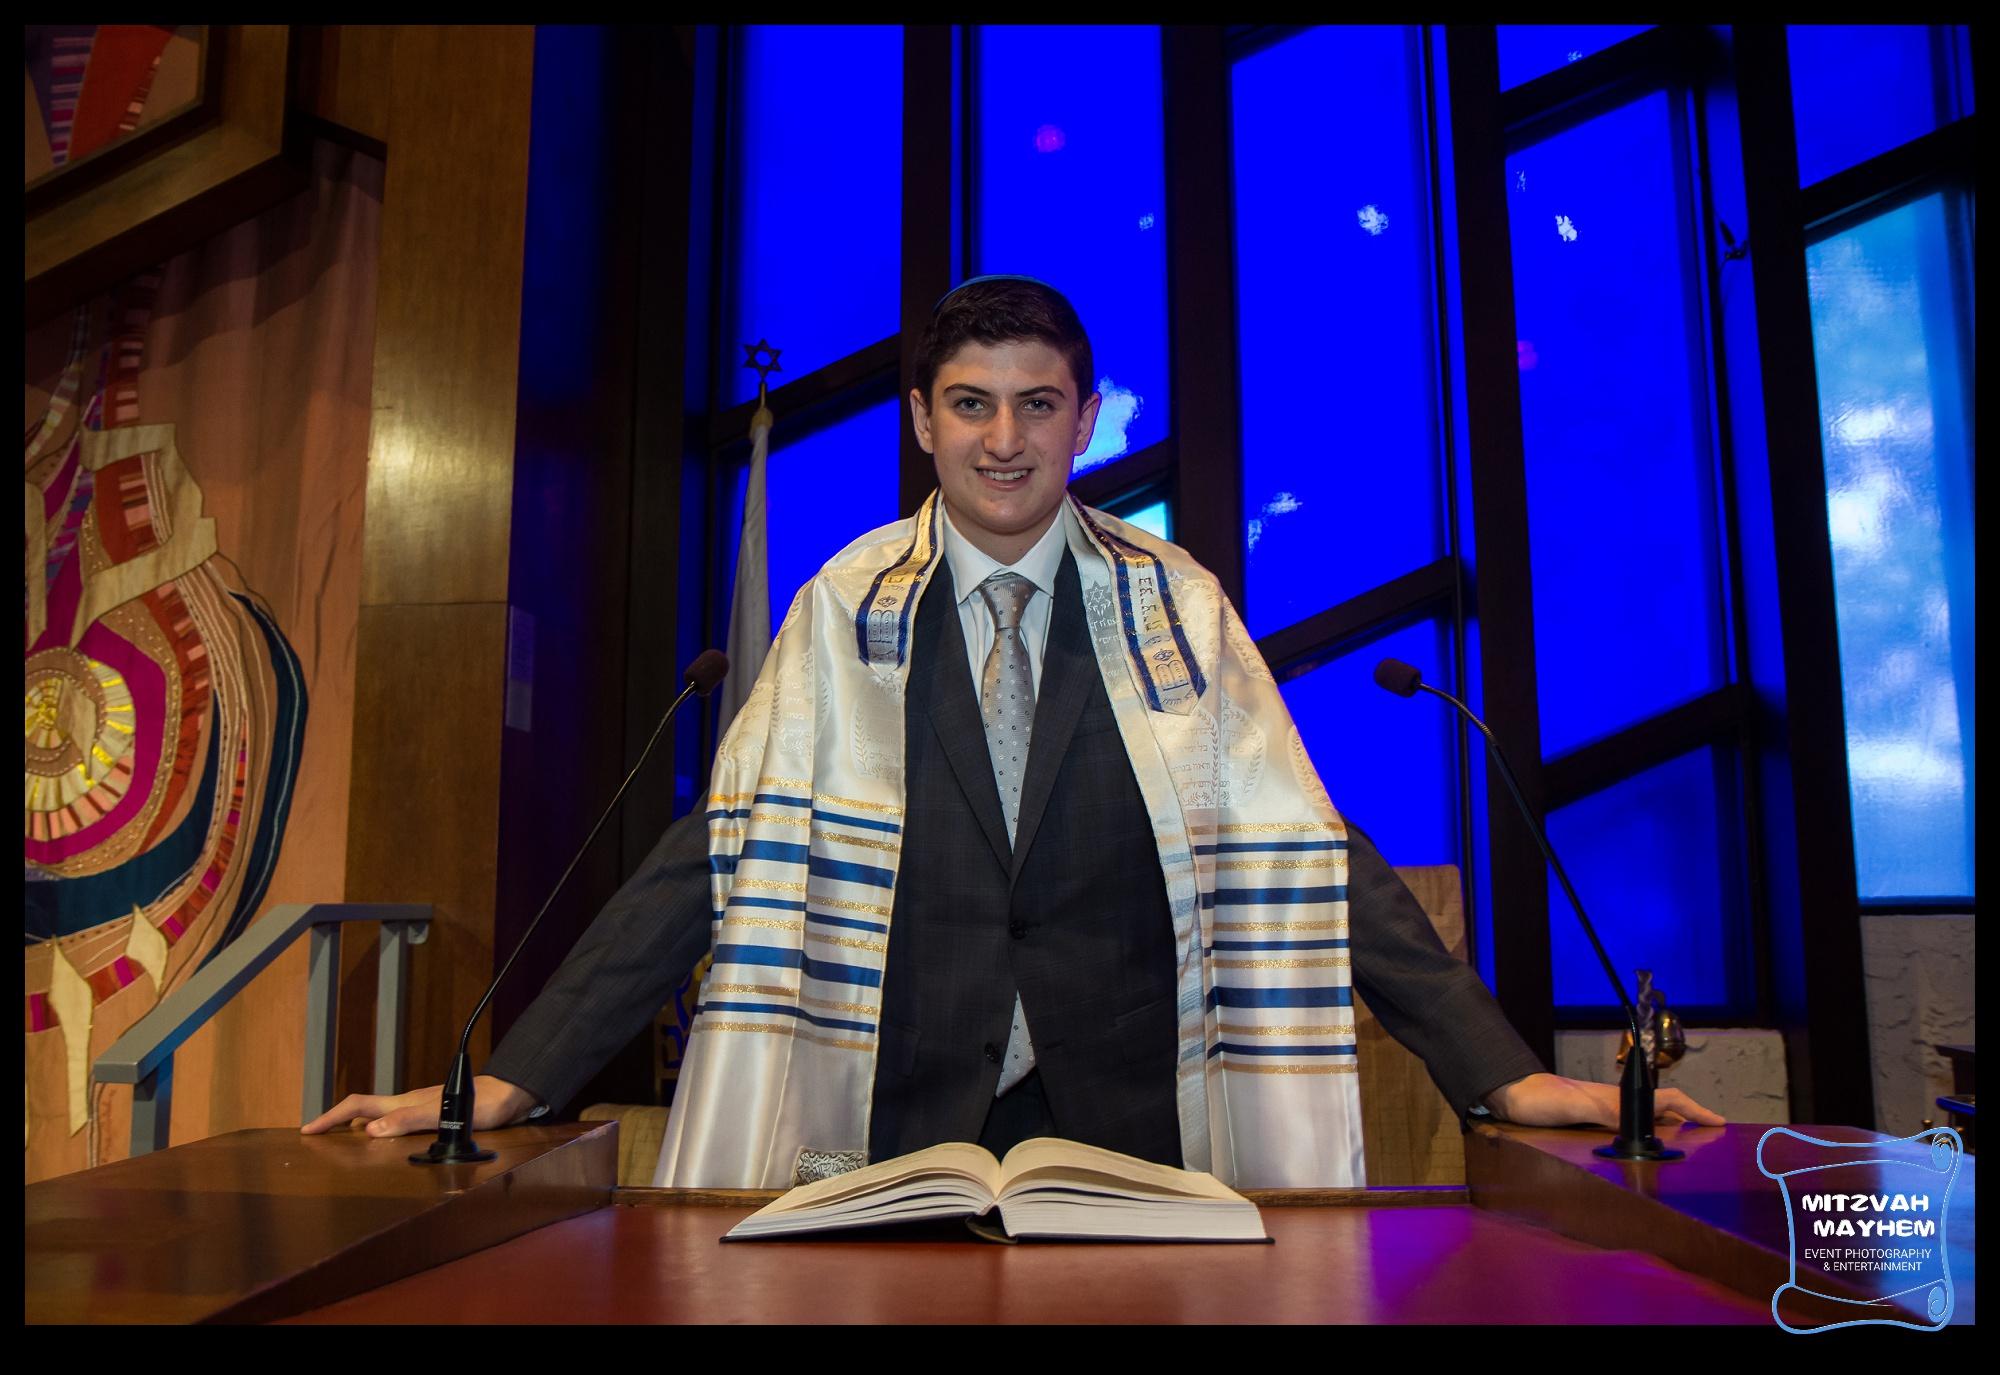 new-jersey-bar-mitzvah-photography-9632.jpg